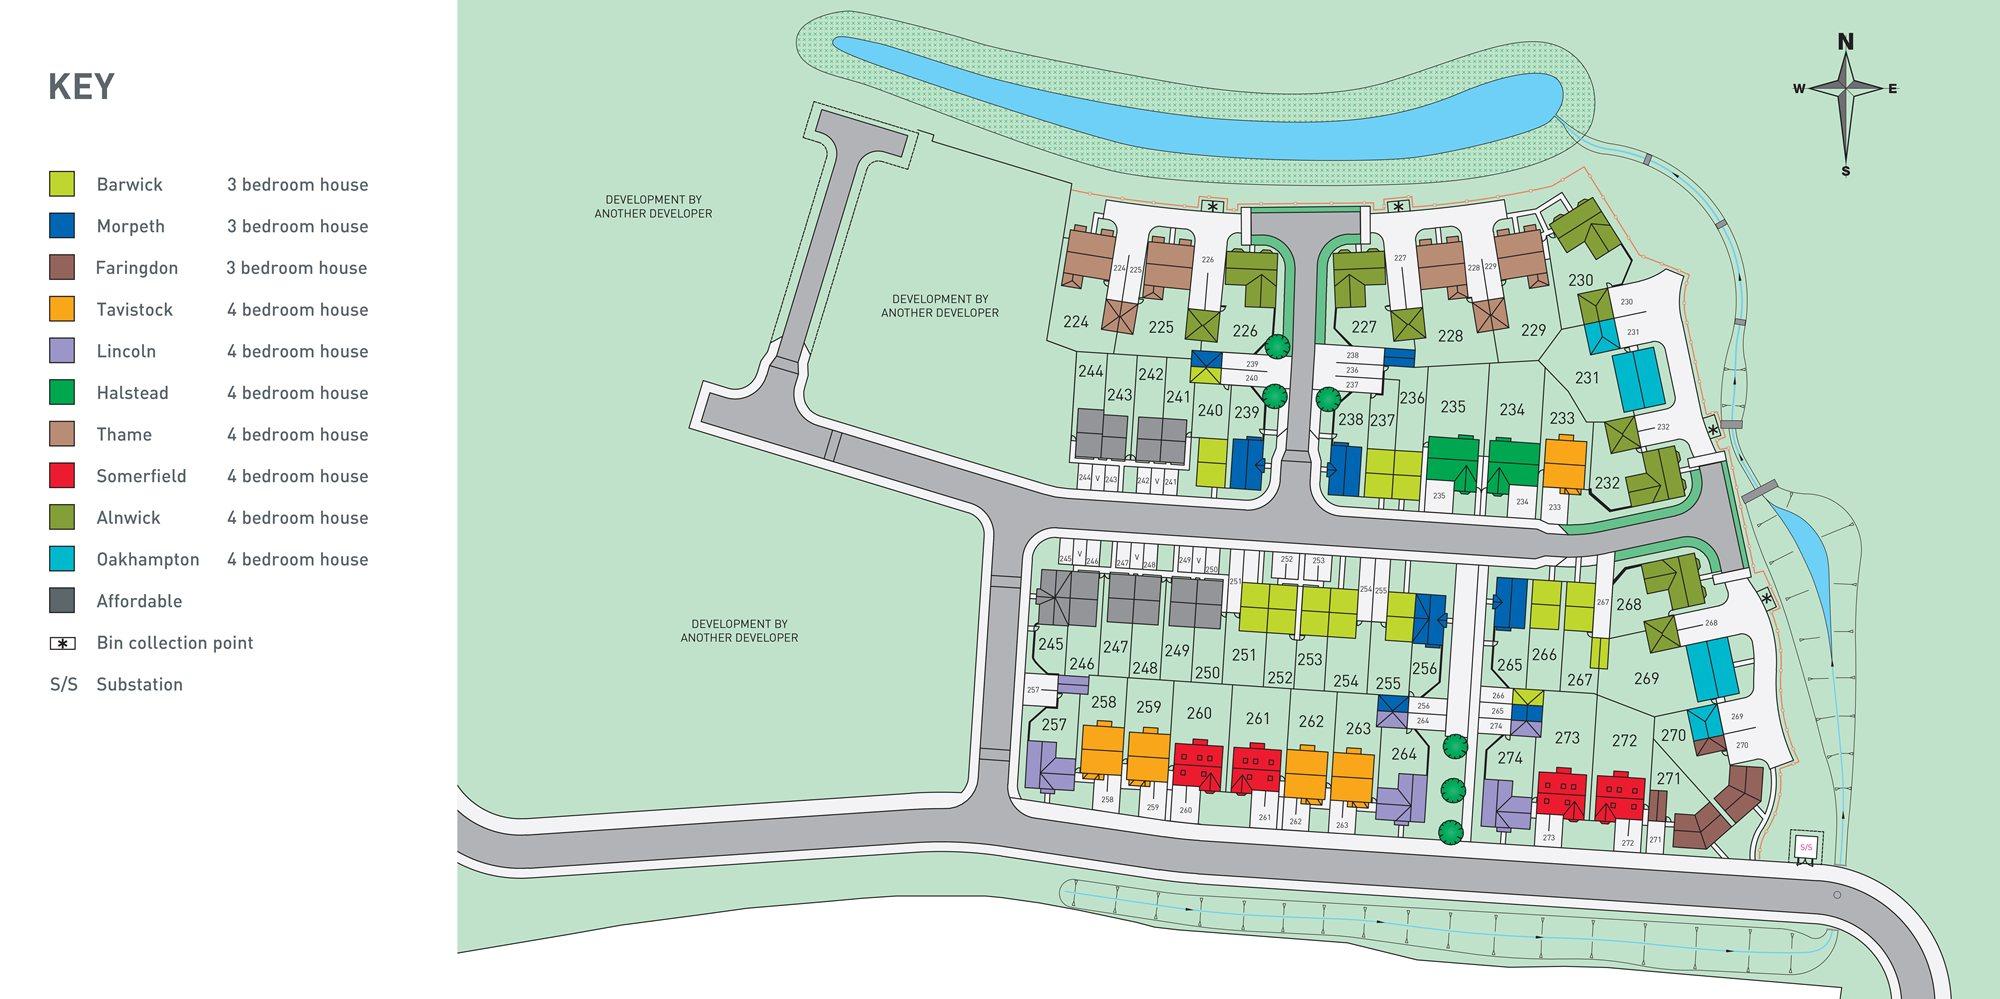 Bowbrook Meadows phase 2 Development Plan